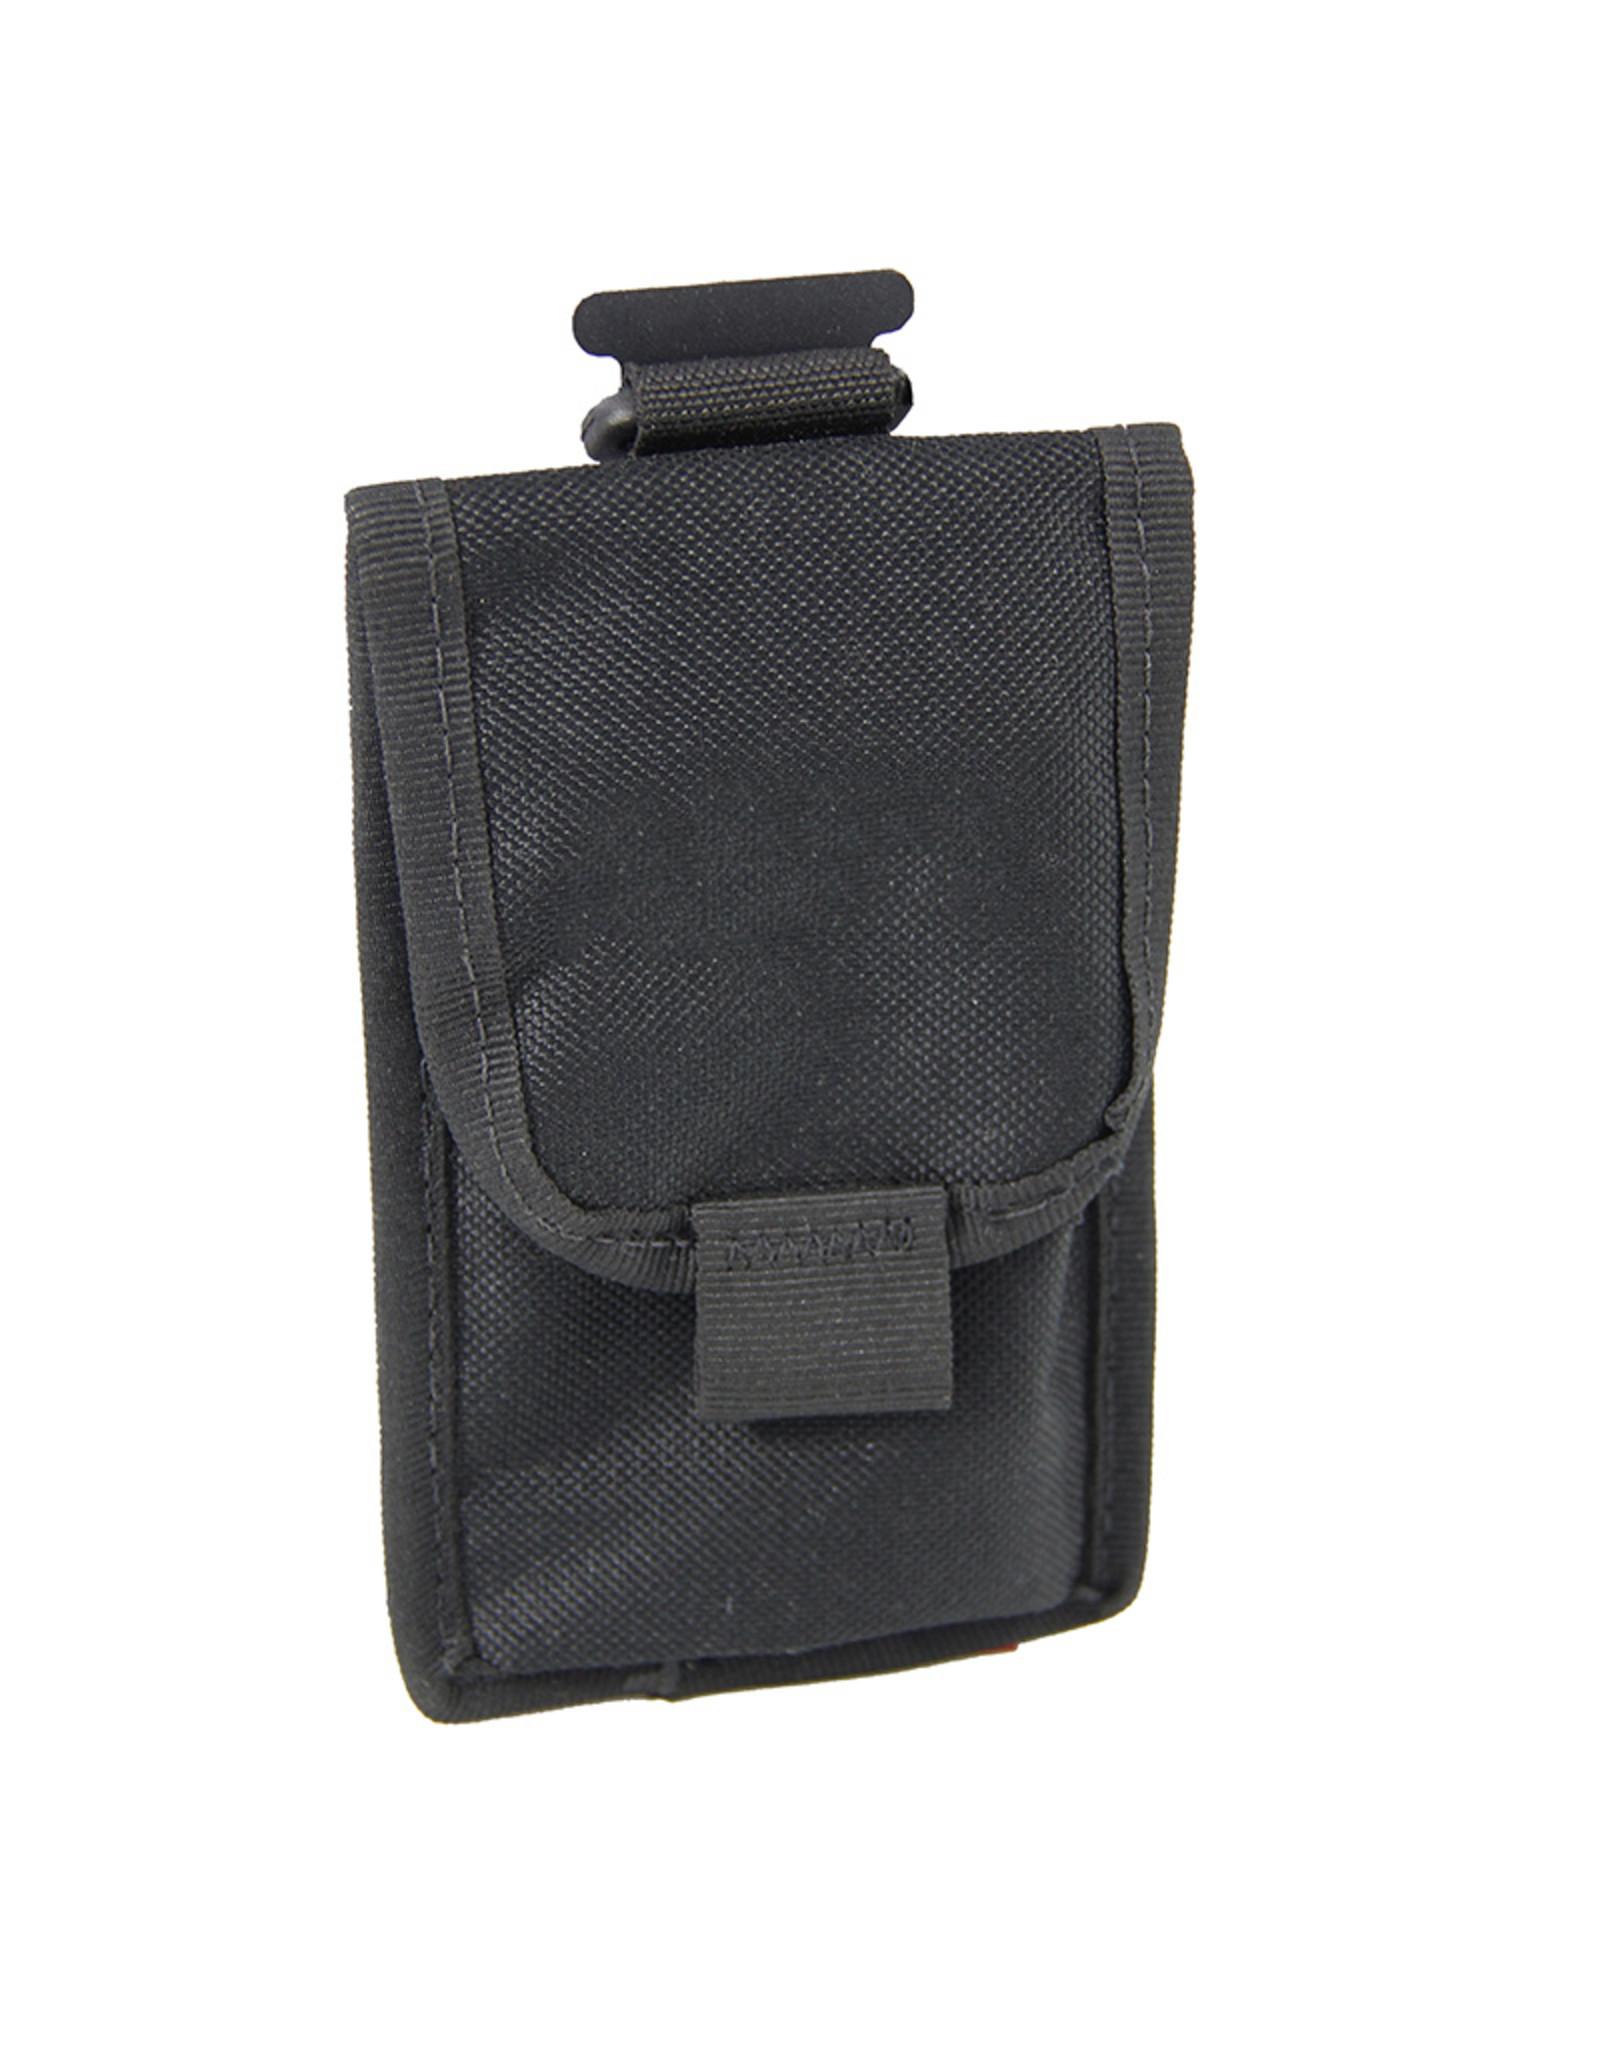 HI-TEC INTERVENTION LOC-Stick Double Latex Glove Pouch - HT5071